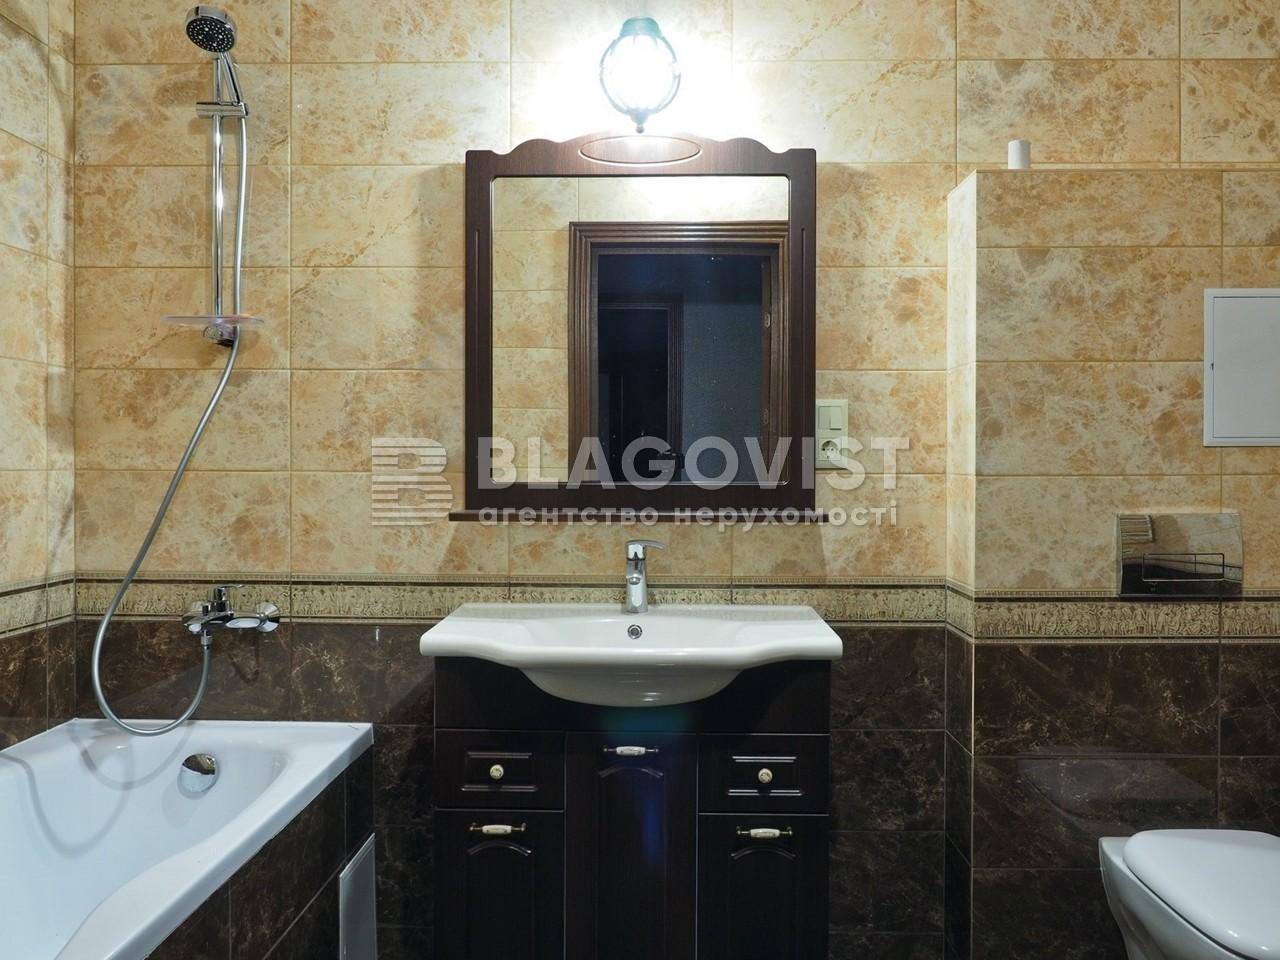 Квартира M-38484, Искровская, 3, Киев - Фото 11